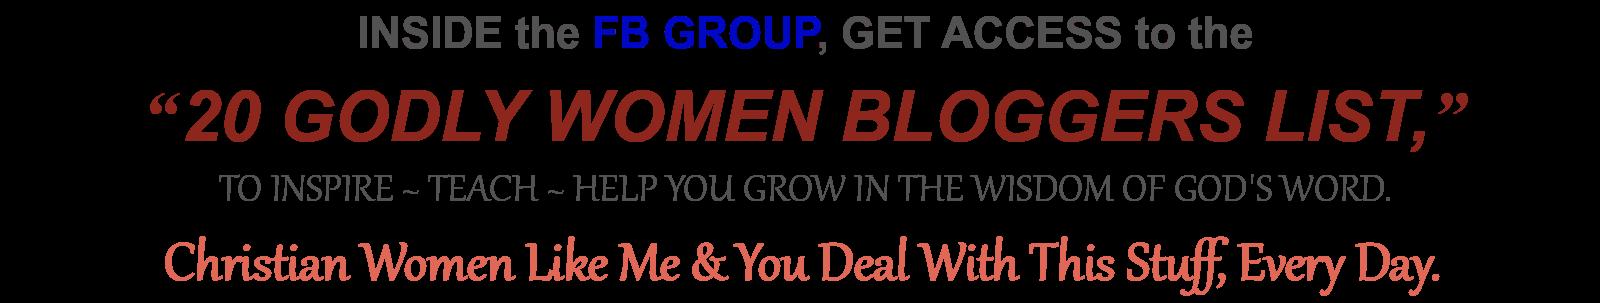 20 GODLY WOMEN BLOGGERS LIST